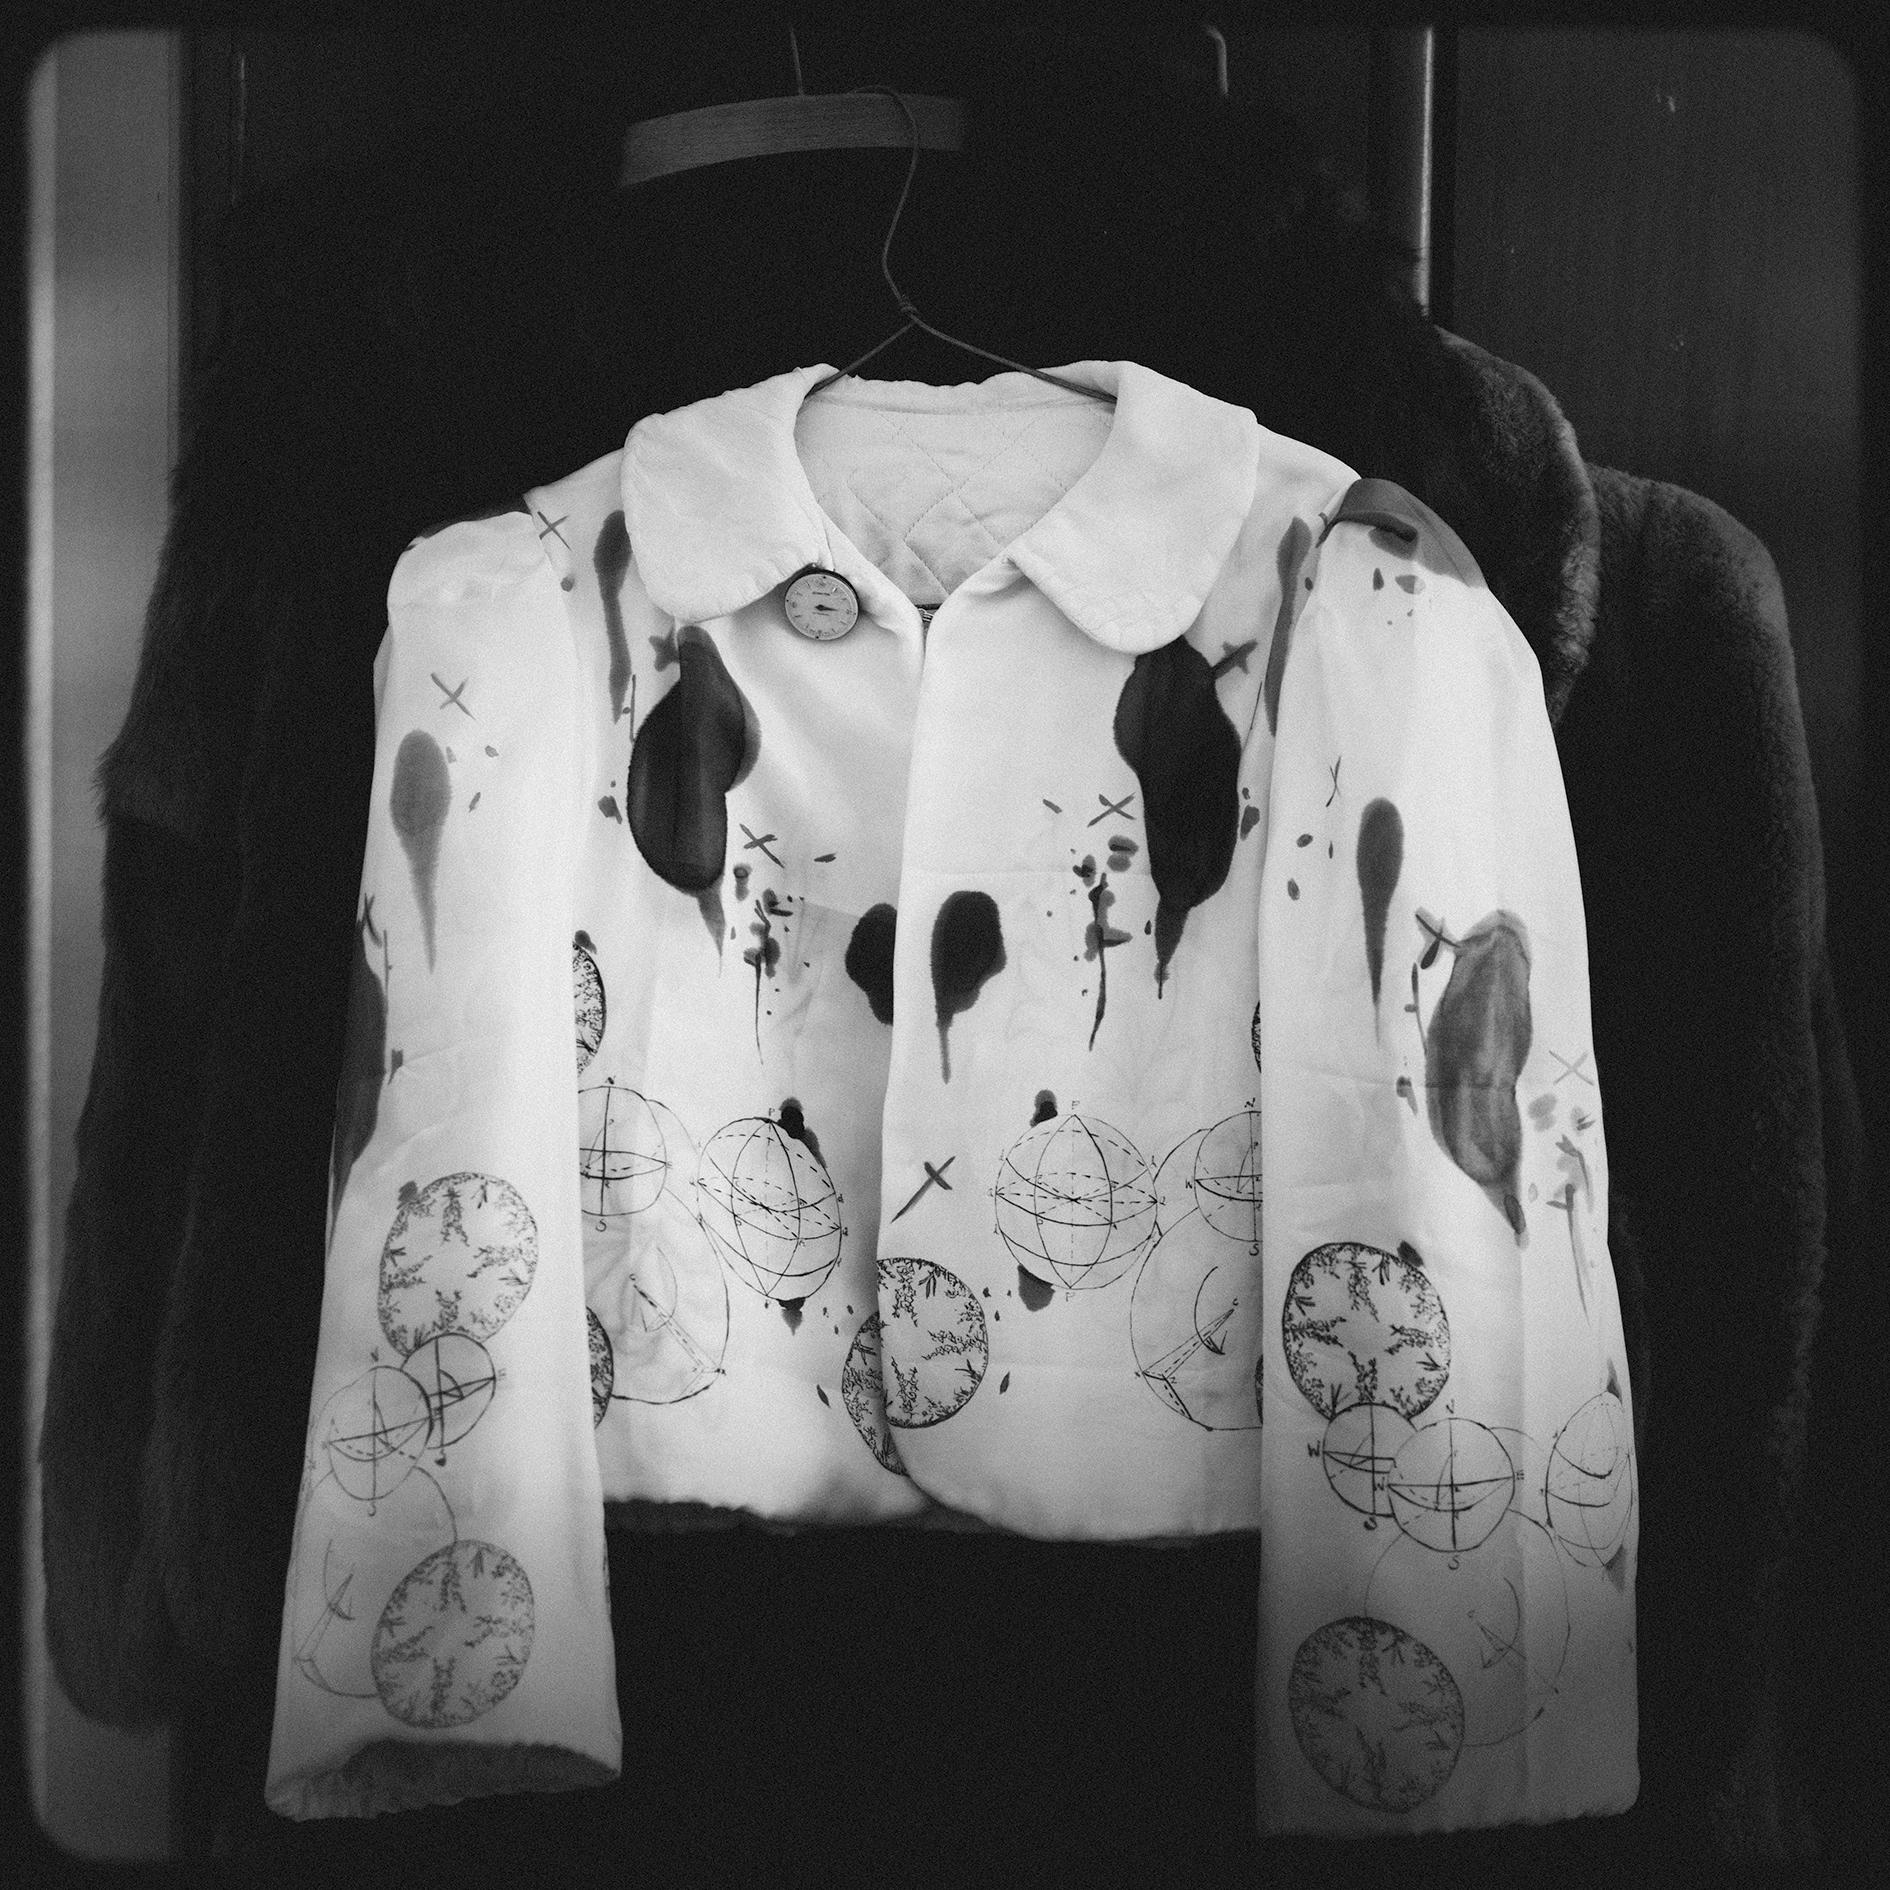 bed-jacket-2-island-review-island-making-Jen-Deschenes (2).jpg